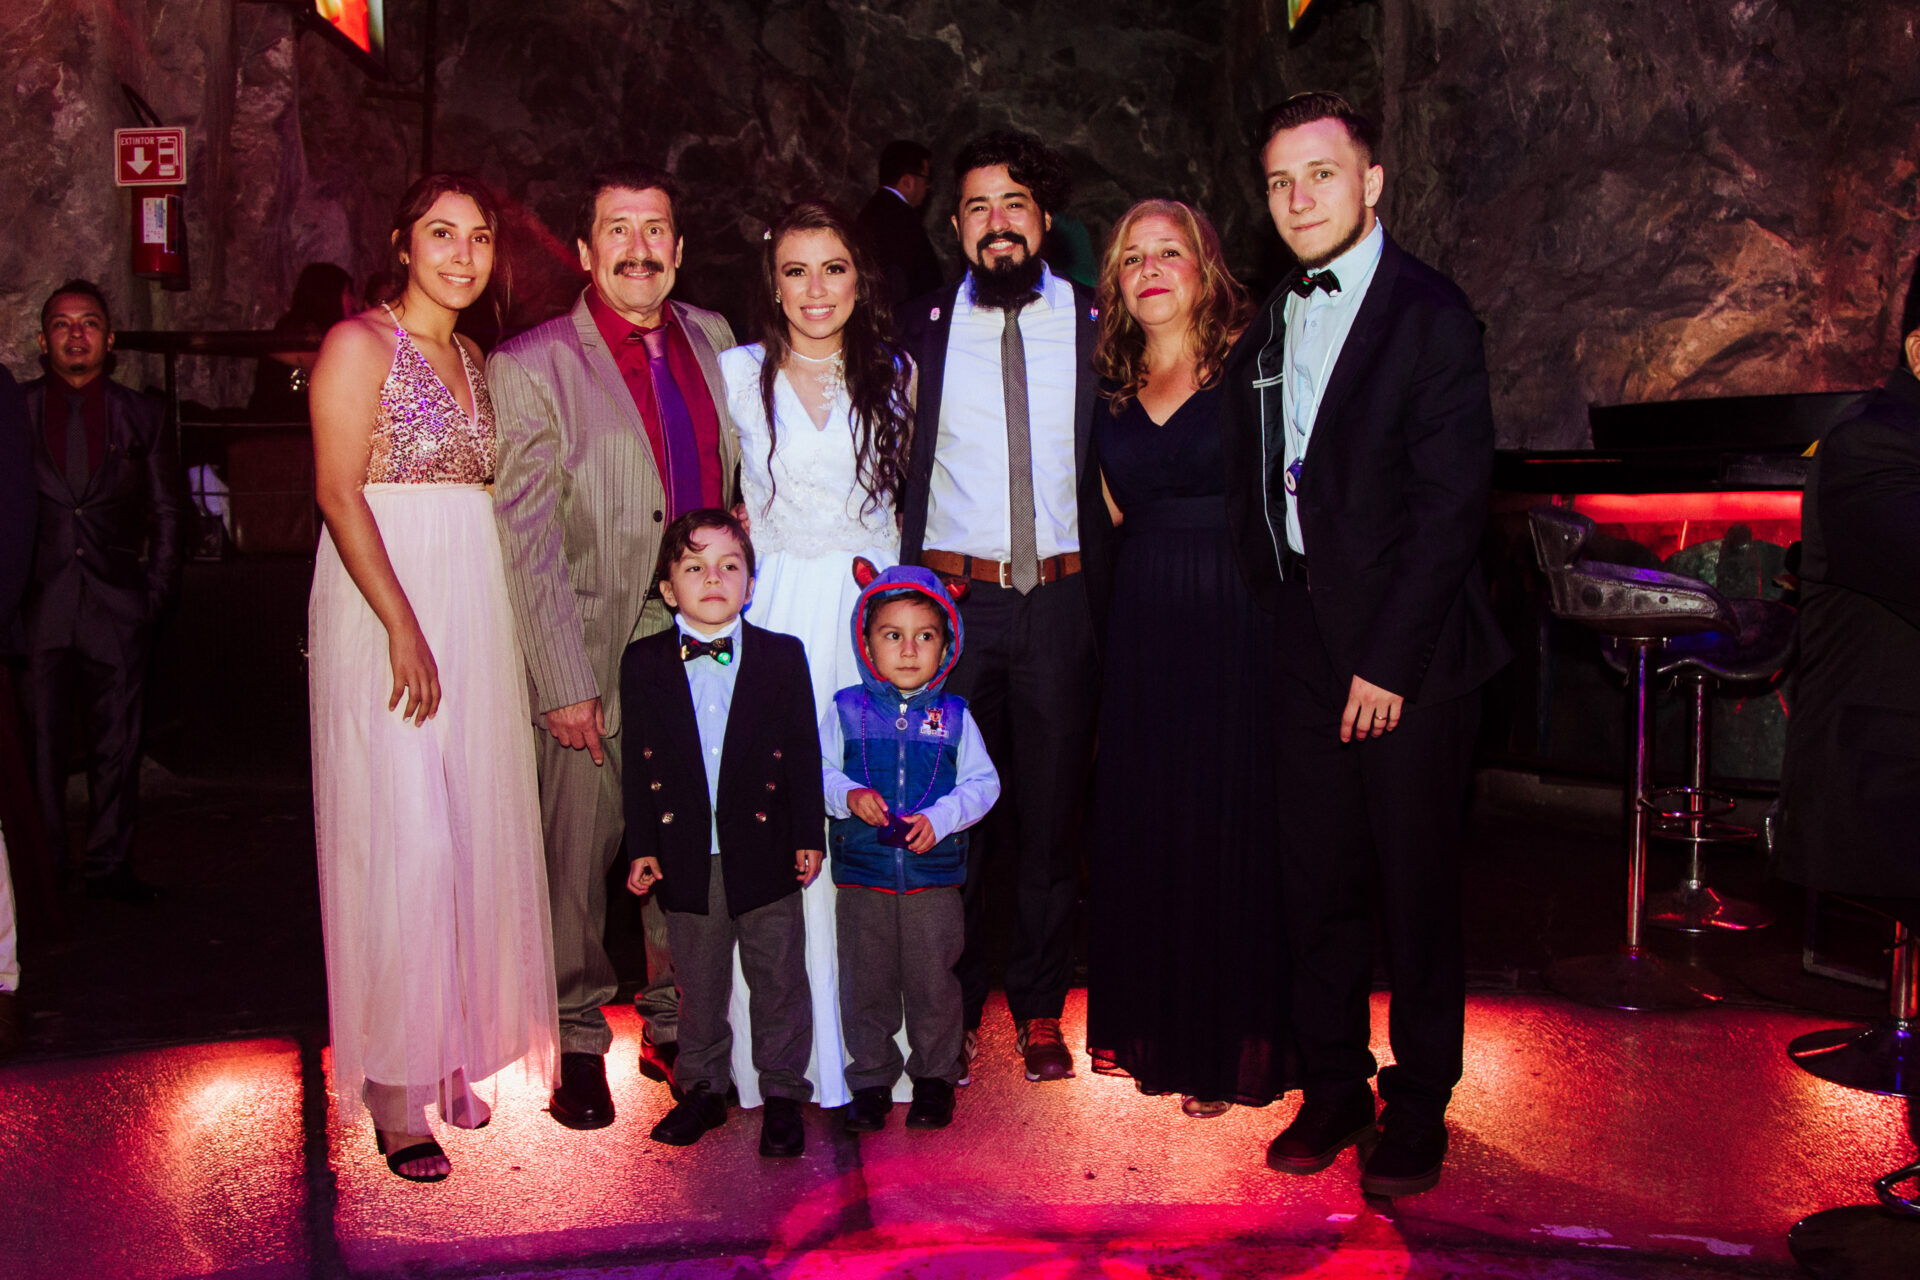 javier_noriega_fotografo_bodas_la_mina_club_zacatecas_wedding_photographer8